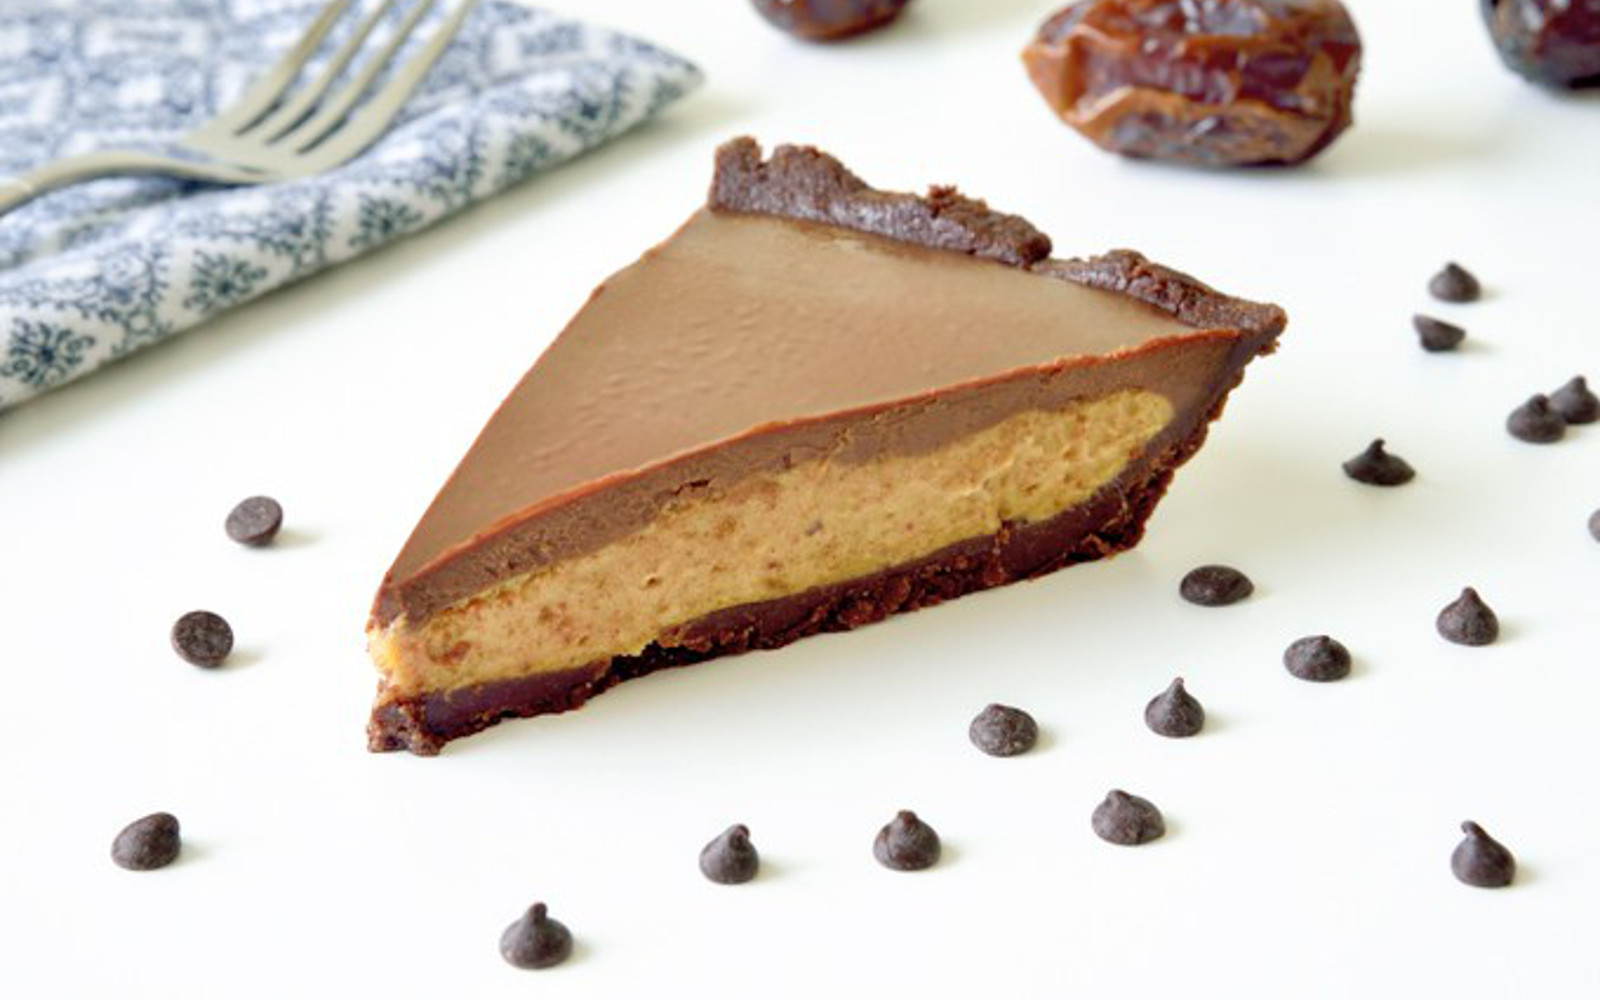 Salted Date Caramel Chocolate Pie